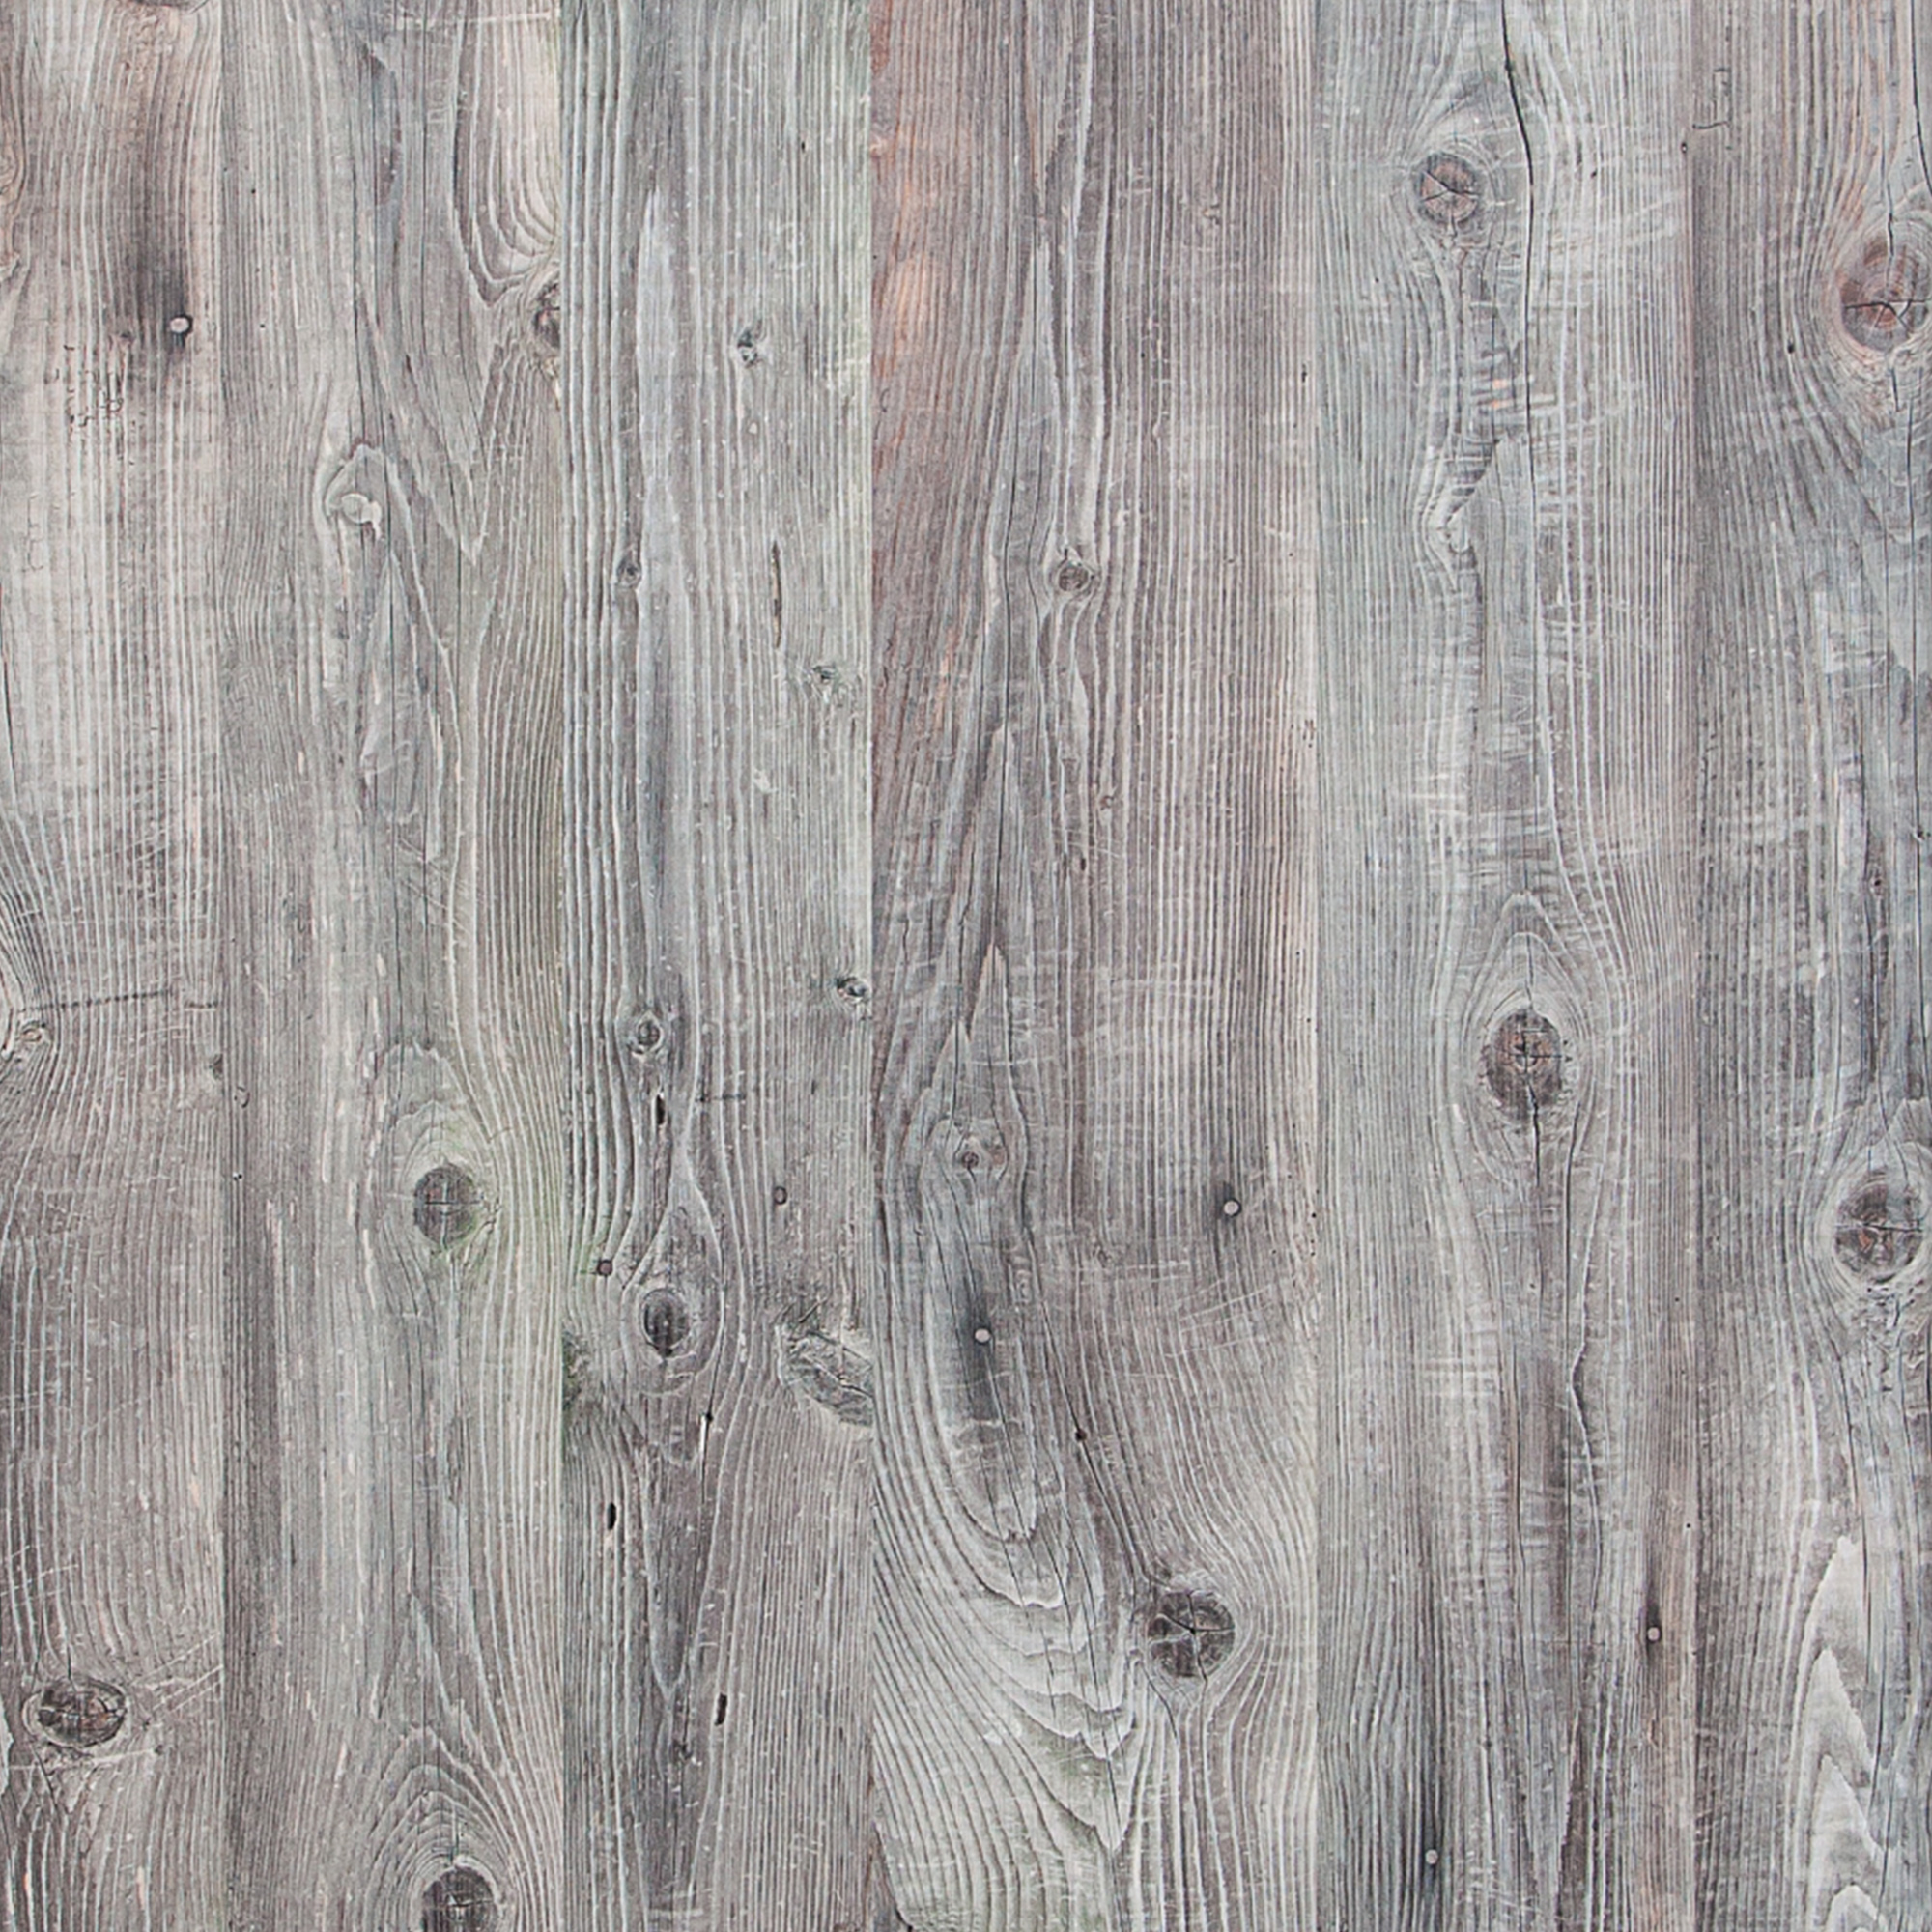 Smrek staré drevo HÜTTE striebrosivý INDEWO® WOOD